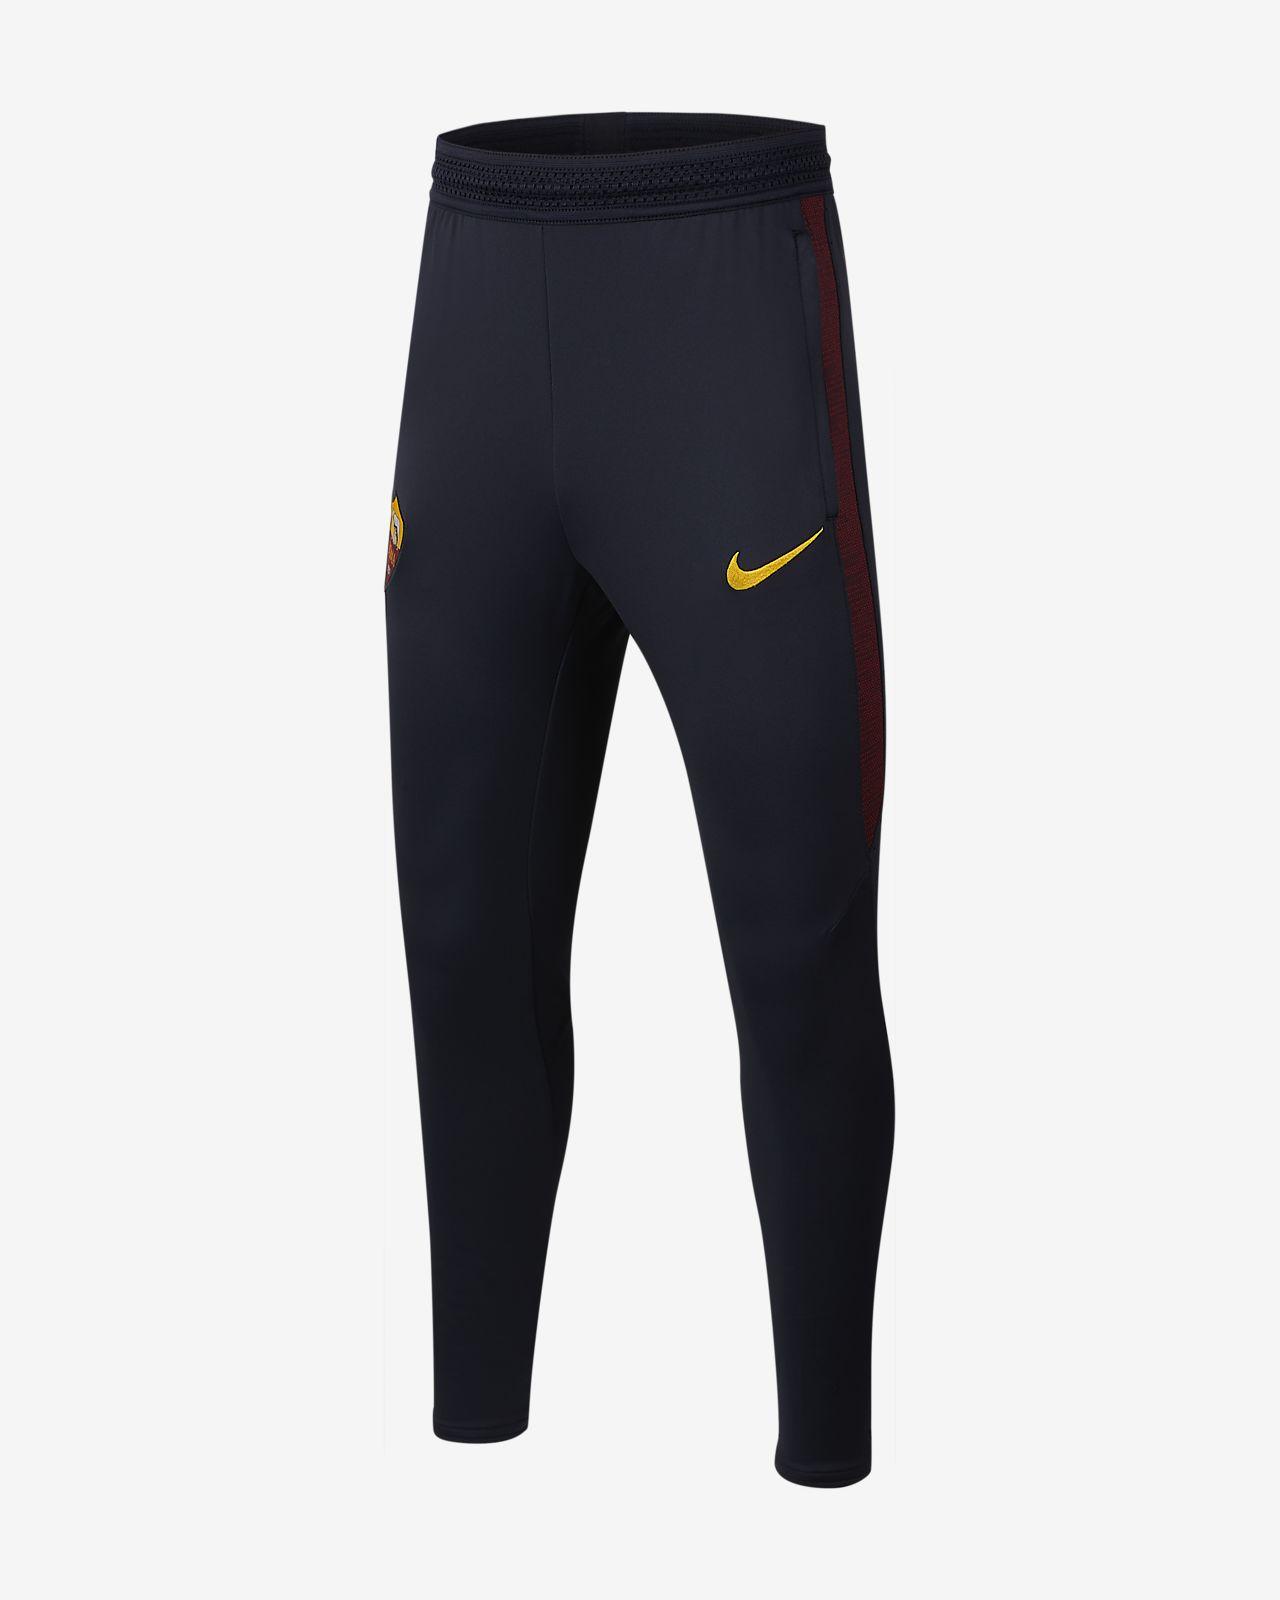 Pantalones de fútbol para niño talla grande Nike Dri-FIT A.S. Roma Strike